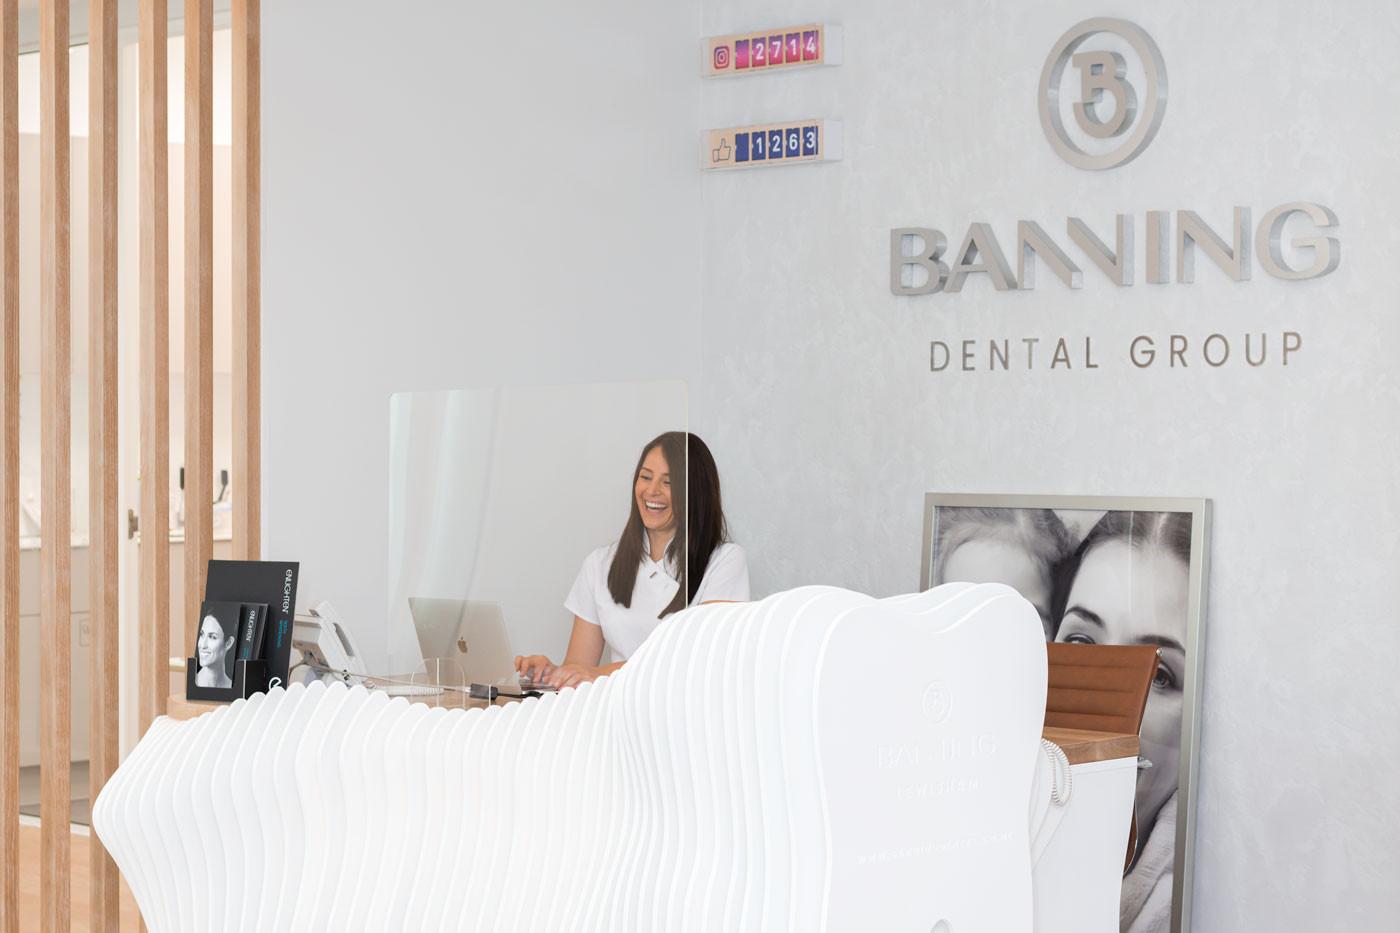 A receptionist smiling whilst sitting behind the bespoke reception desk at Banning Dental Group Lewisham